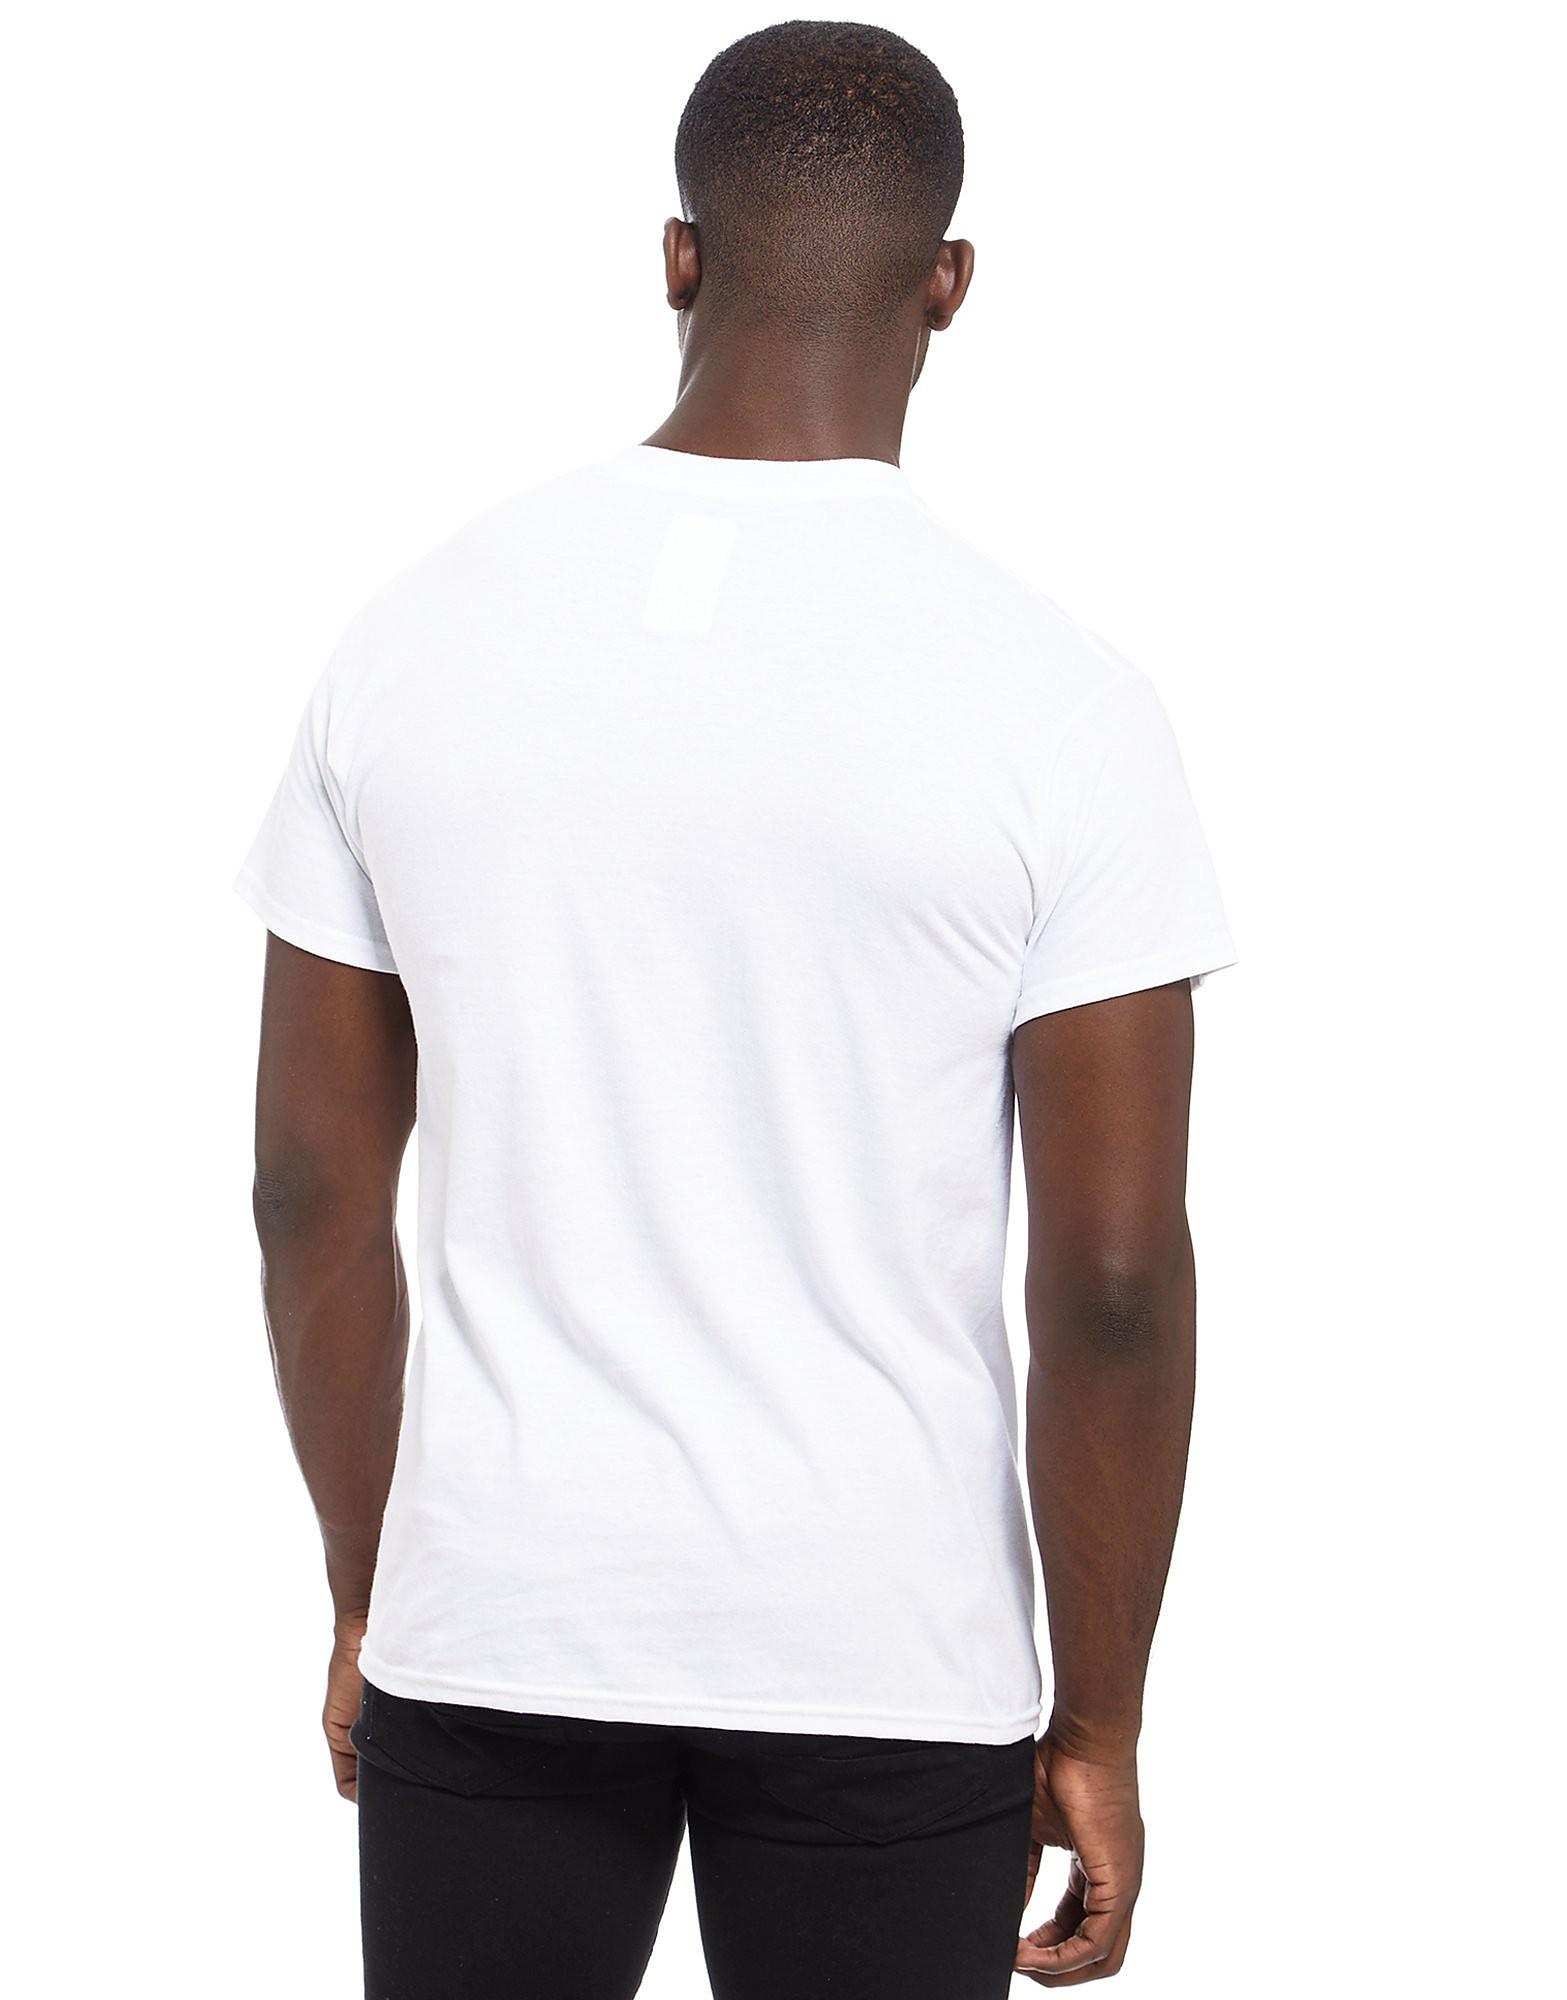 SOURCE LAB LTD Tottenham Hotspur FC Established T-Shirt